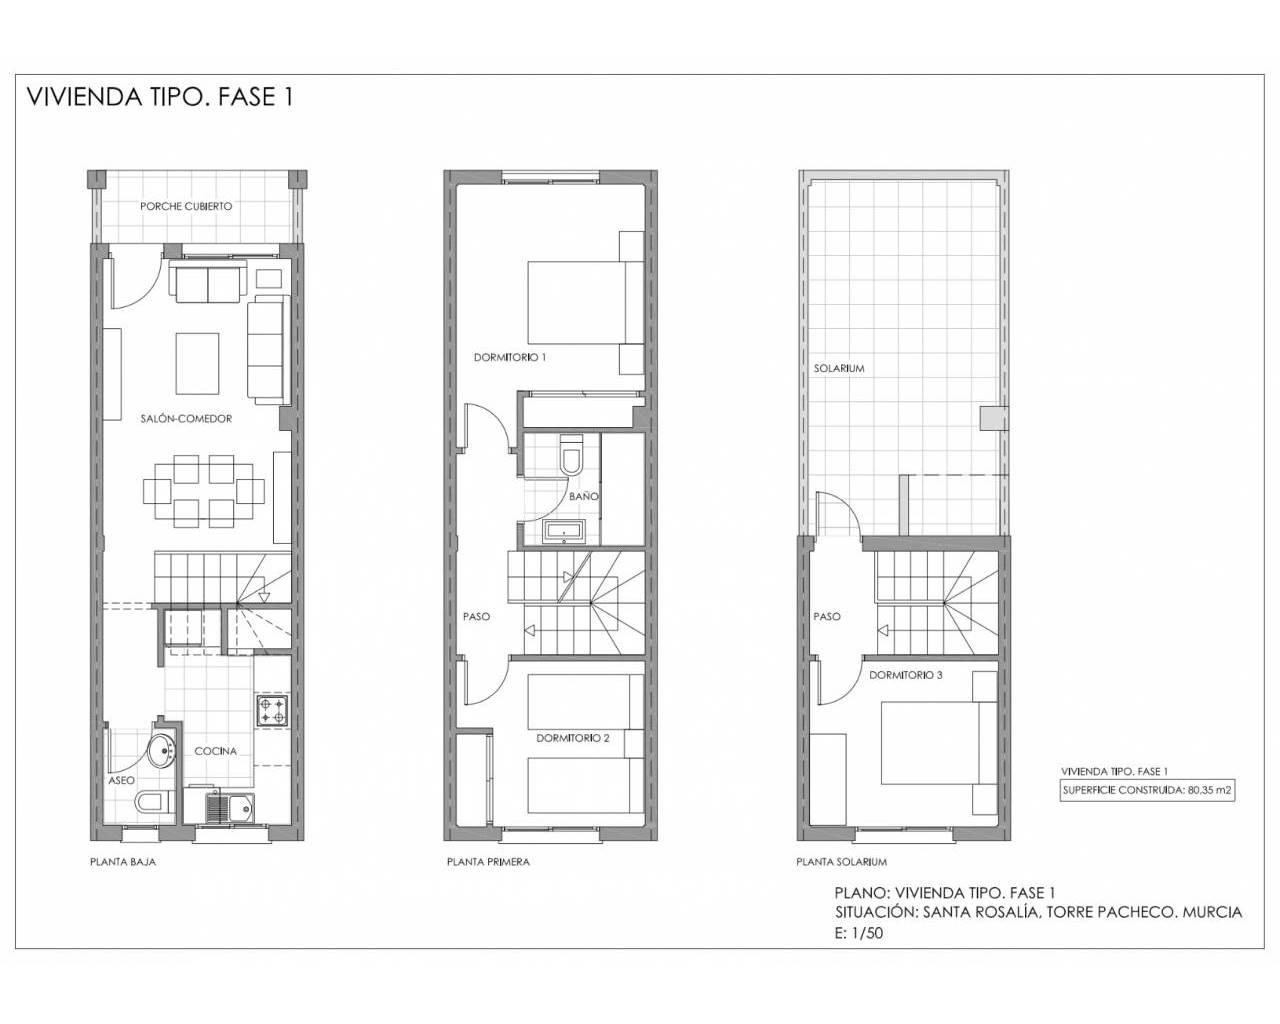 nieuwbouw-geschakelde-woning-duplex-torre-pacheco-santa-rosalia_4603_xl